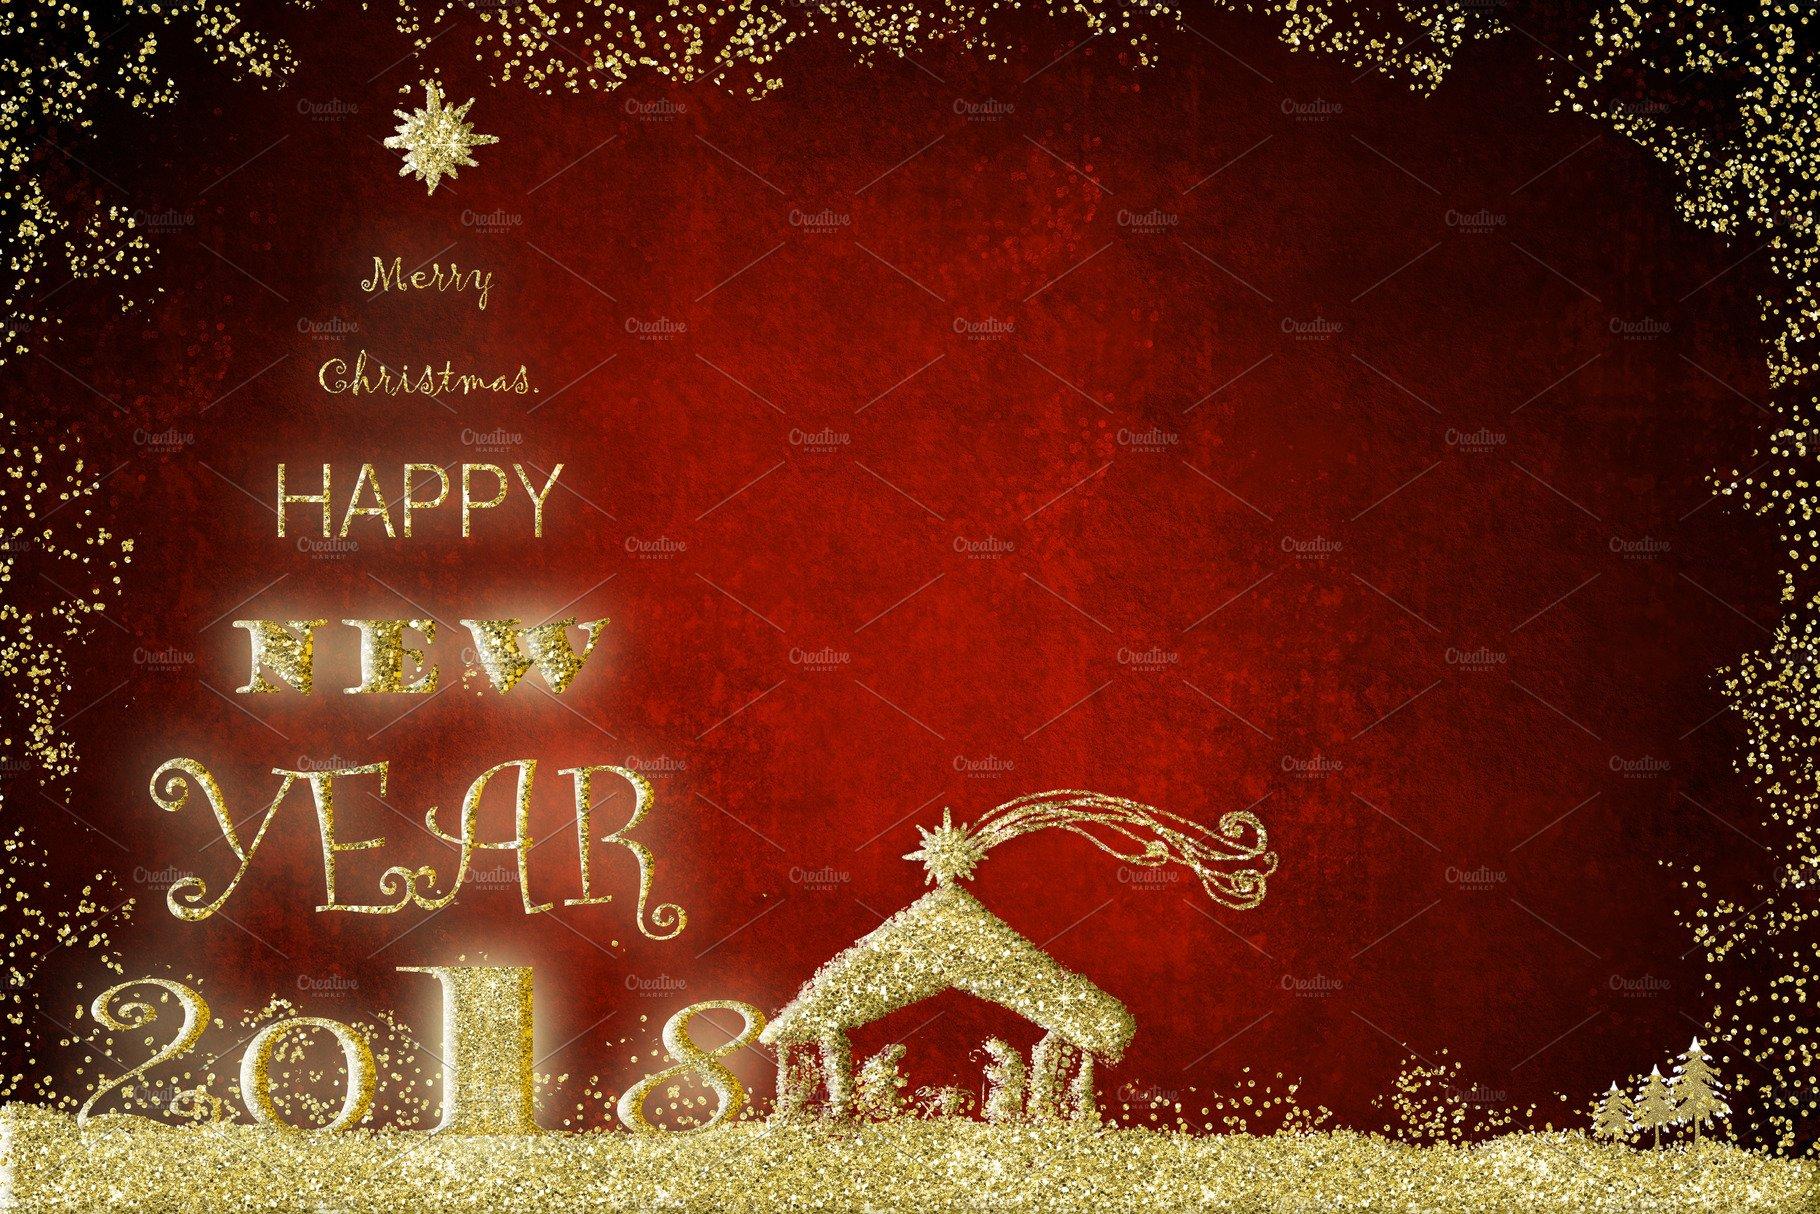 2018 Happy New Year Greeting Card Holiday Photos Creative Market